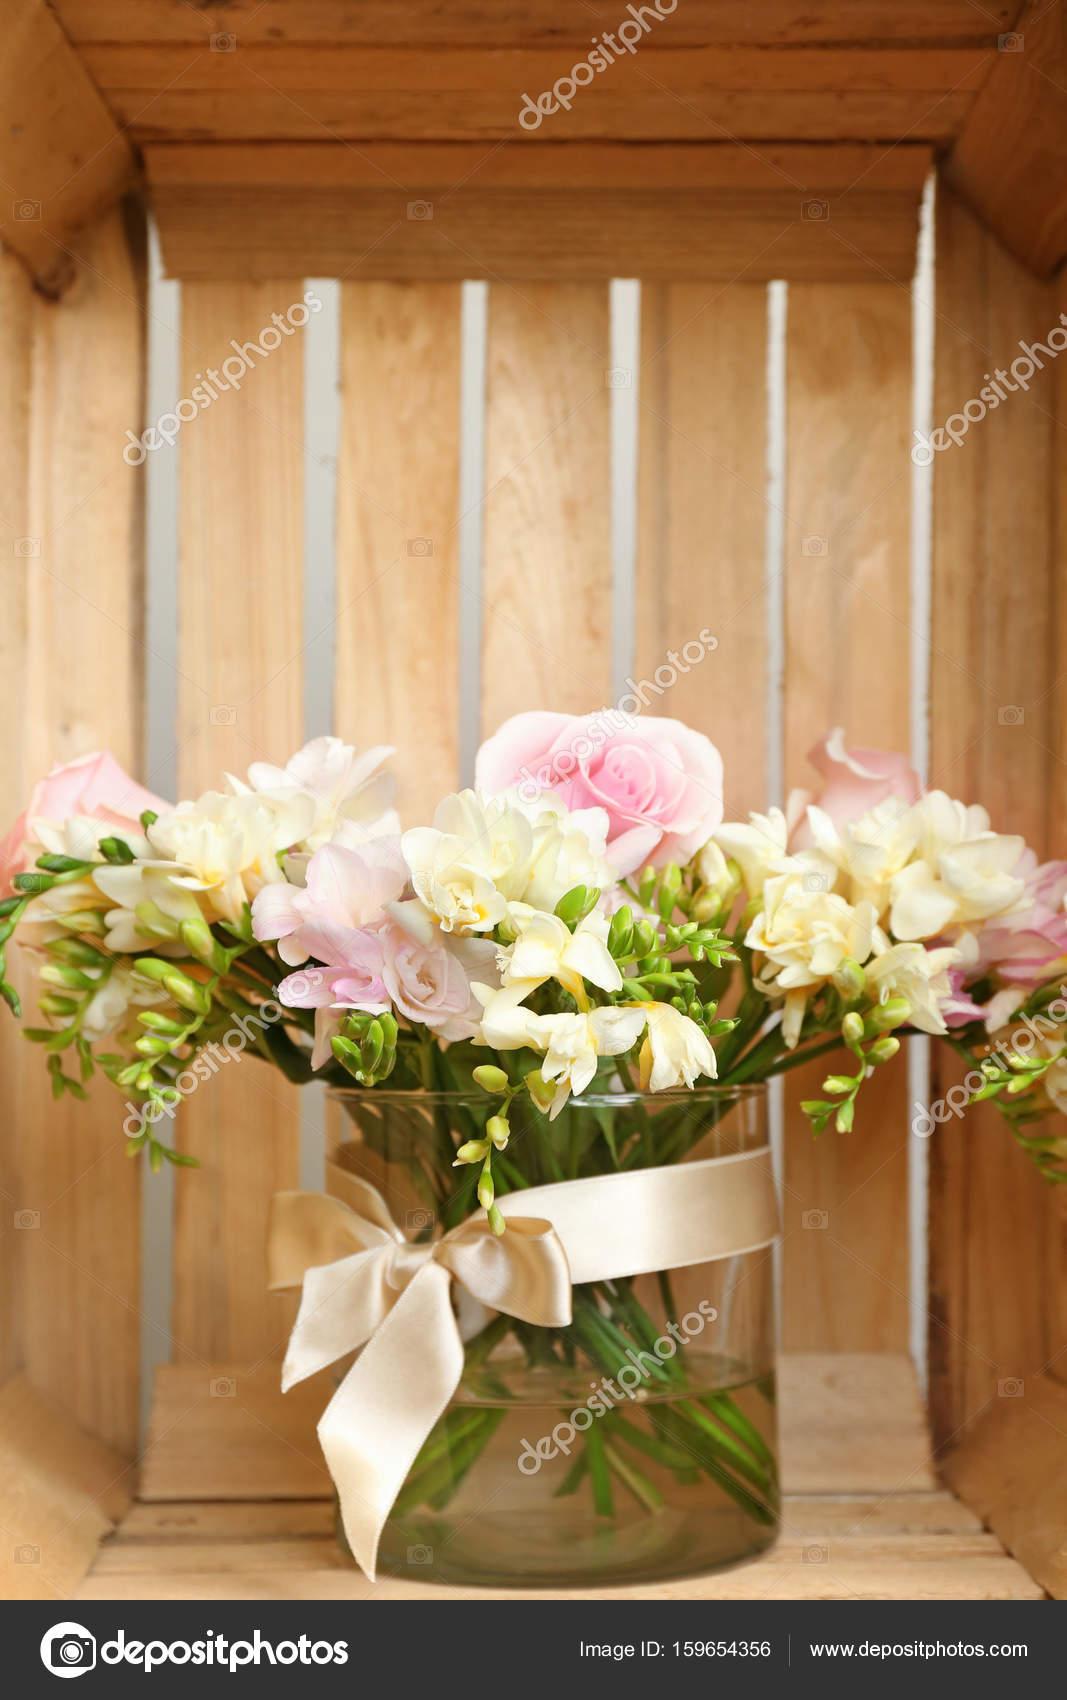 Bouquet with freesia flowers stock photo belchonock 159654356 beautiful bouquet with freesia flowers in wooden box photo by belchonock izmirmasajfo